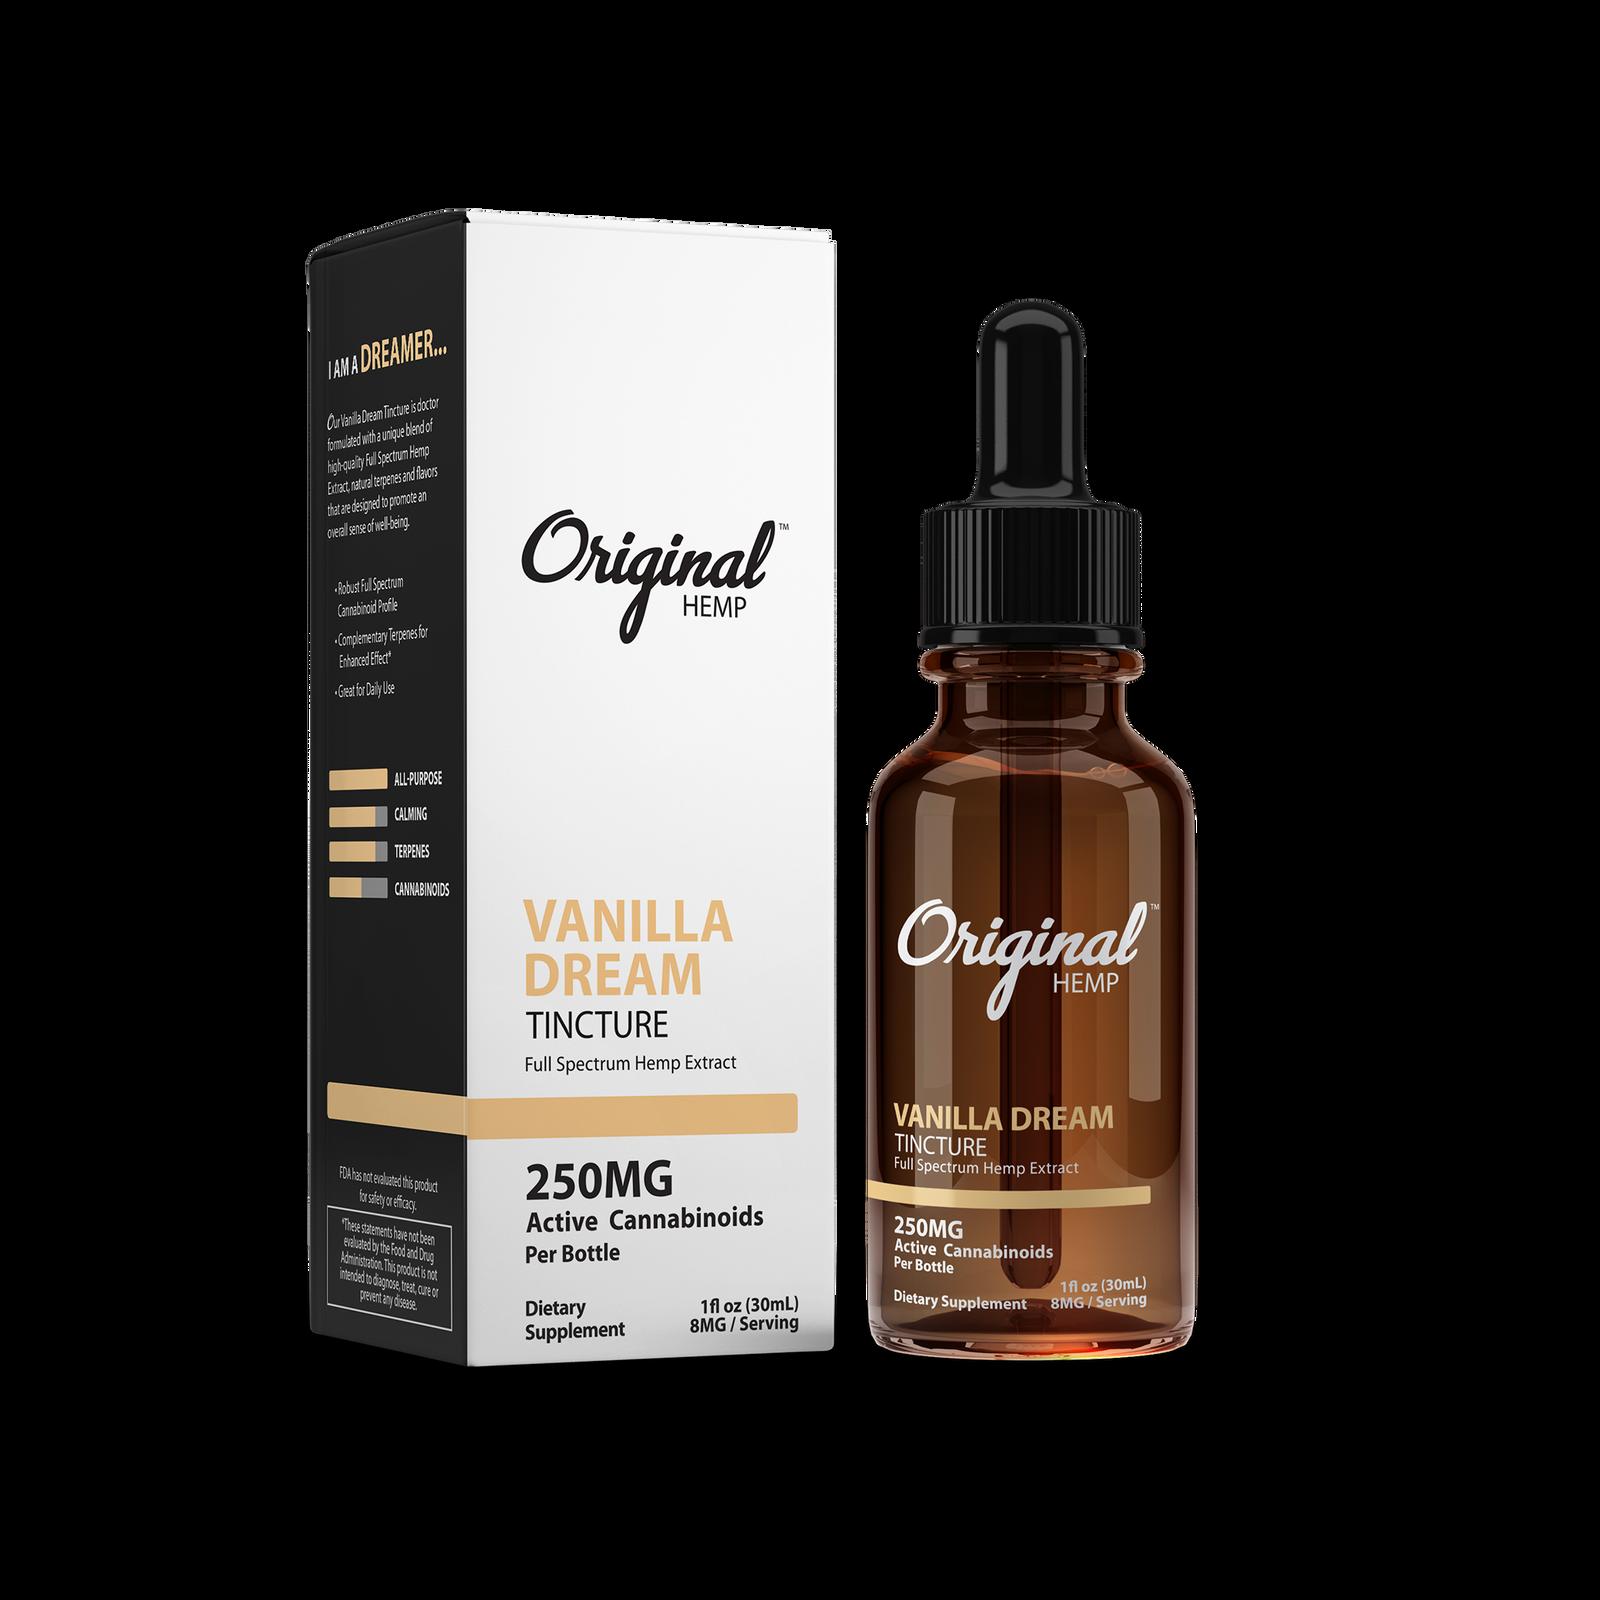 Vanilla Dream MCT Oil by Original Hemp